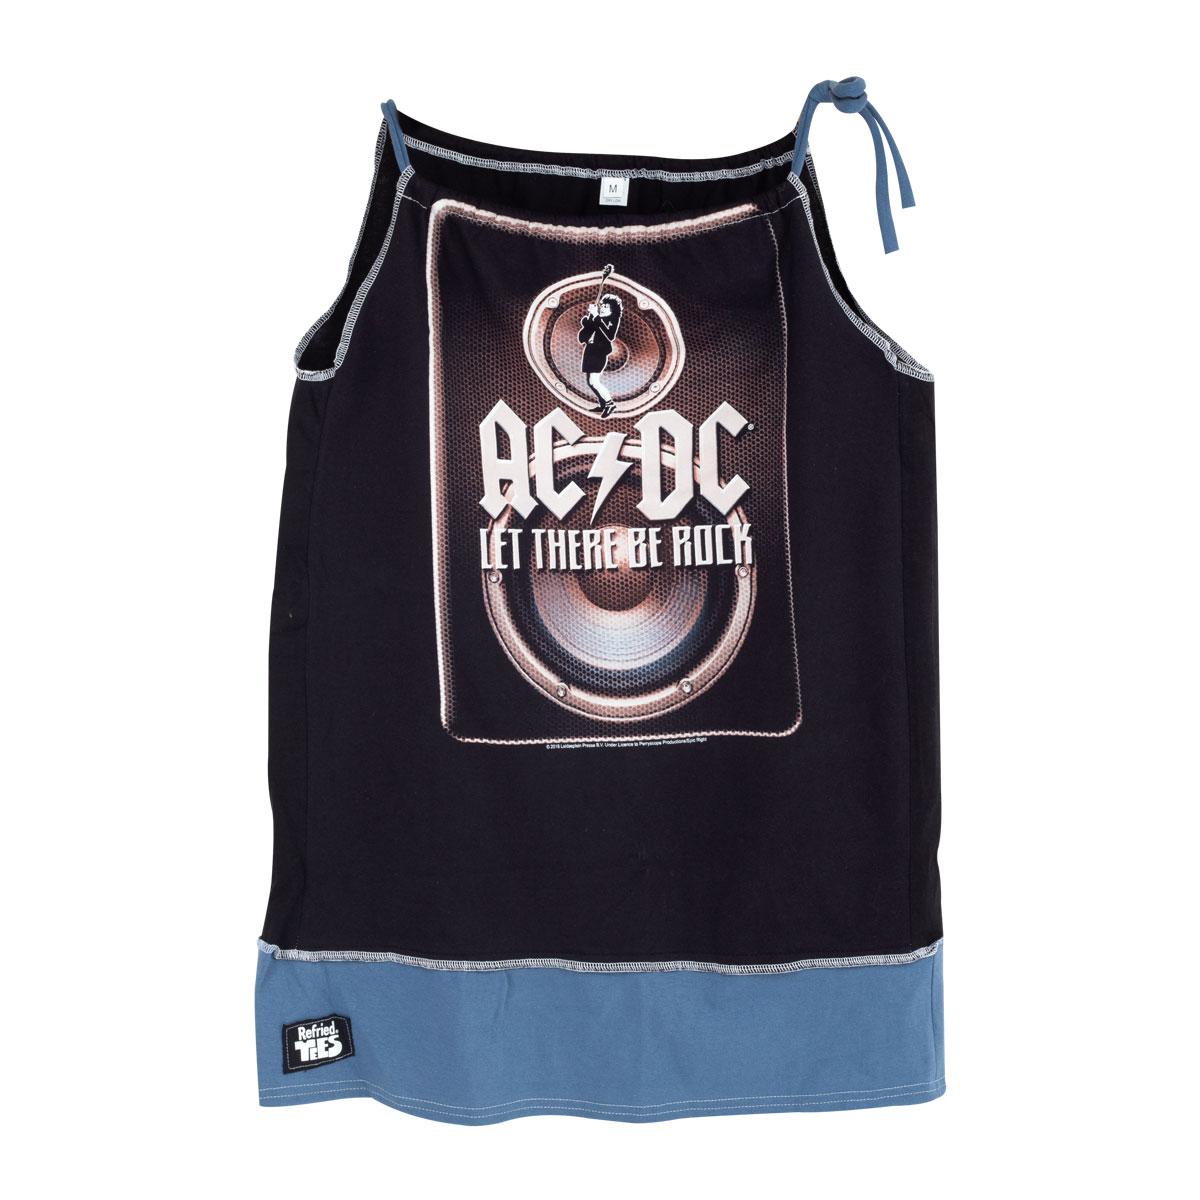 ACDC Tank Dress